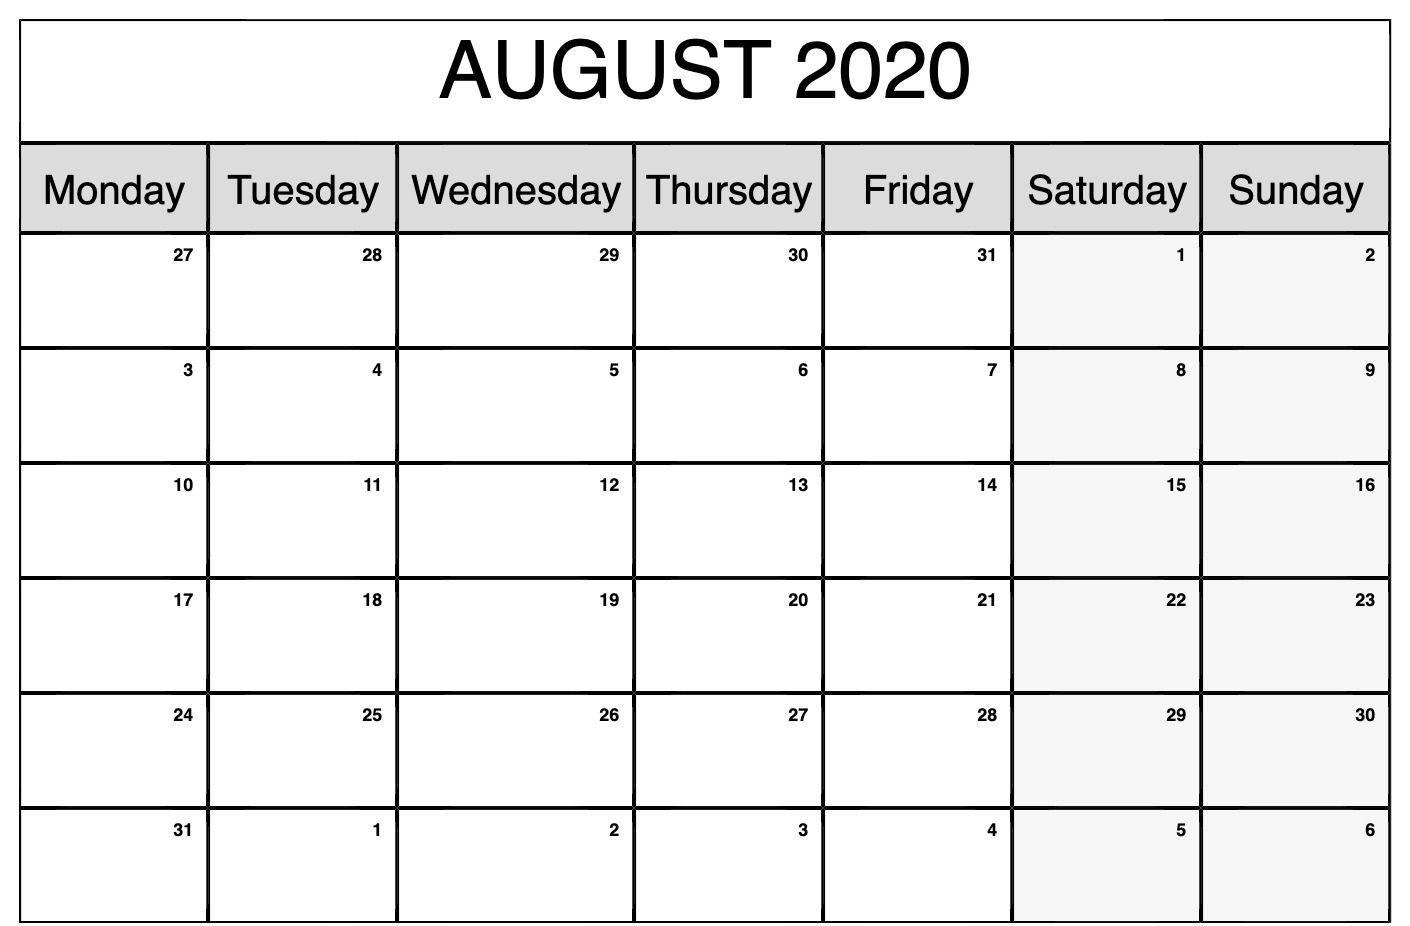 monthly calendar template august 2020 | editable calendar